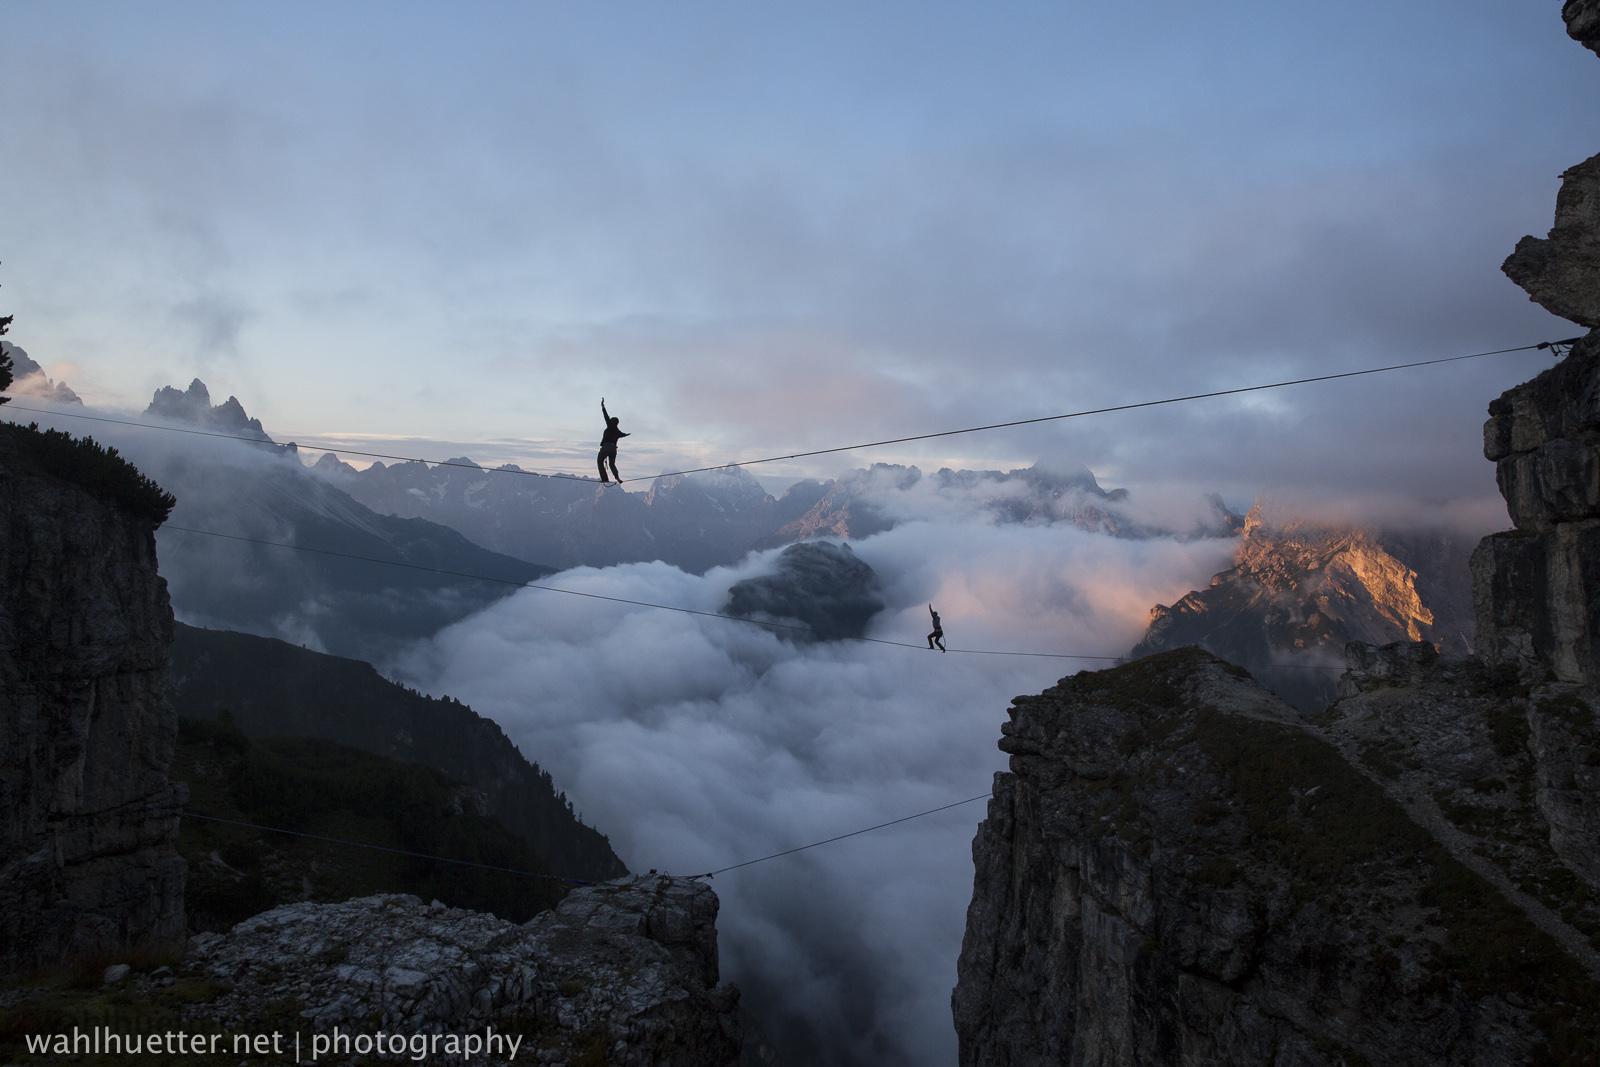 MontePiana-Highline-Wahlhuetter-7